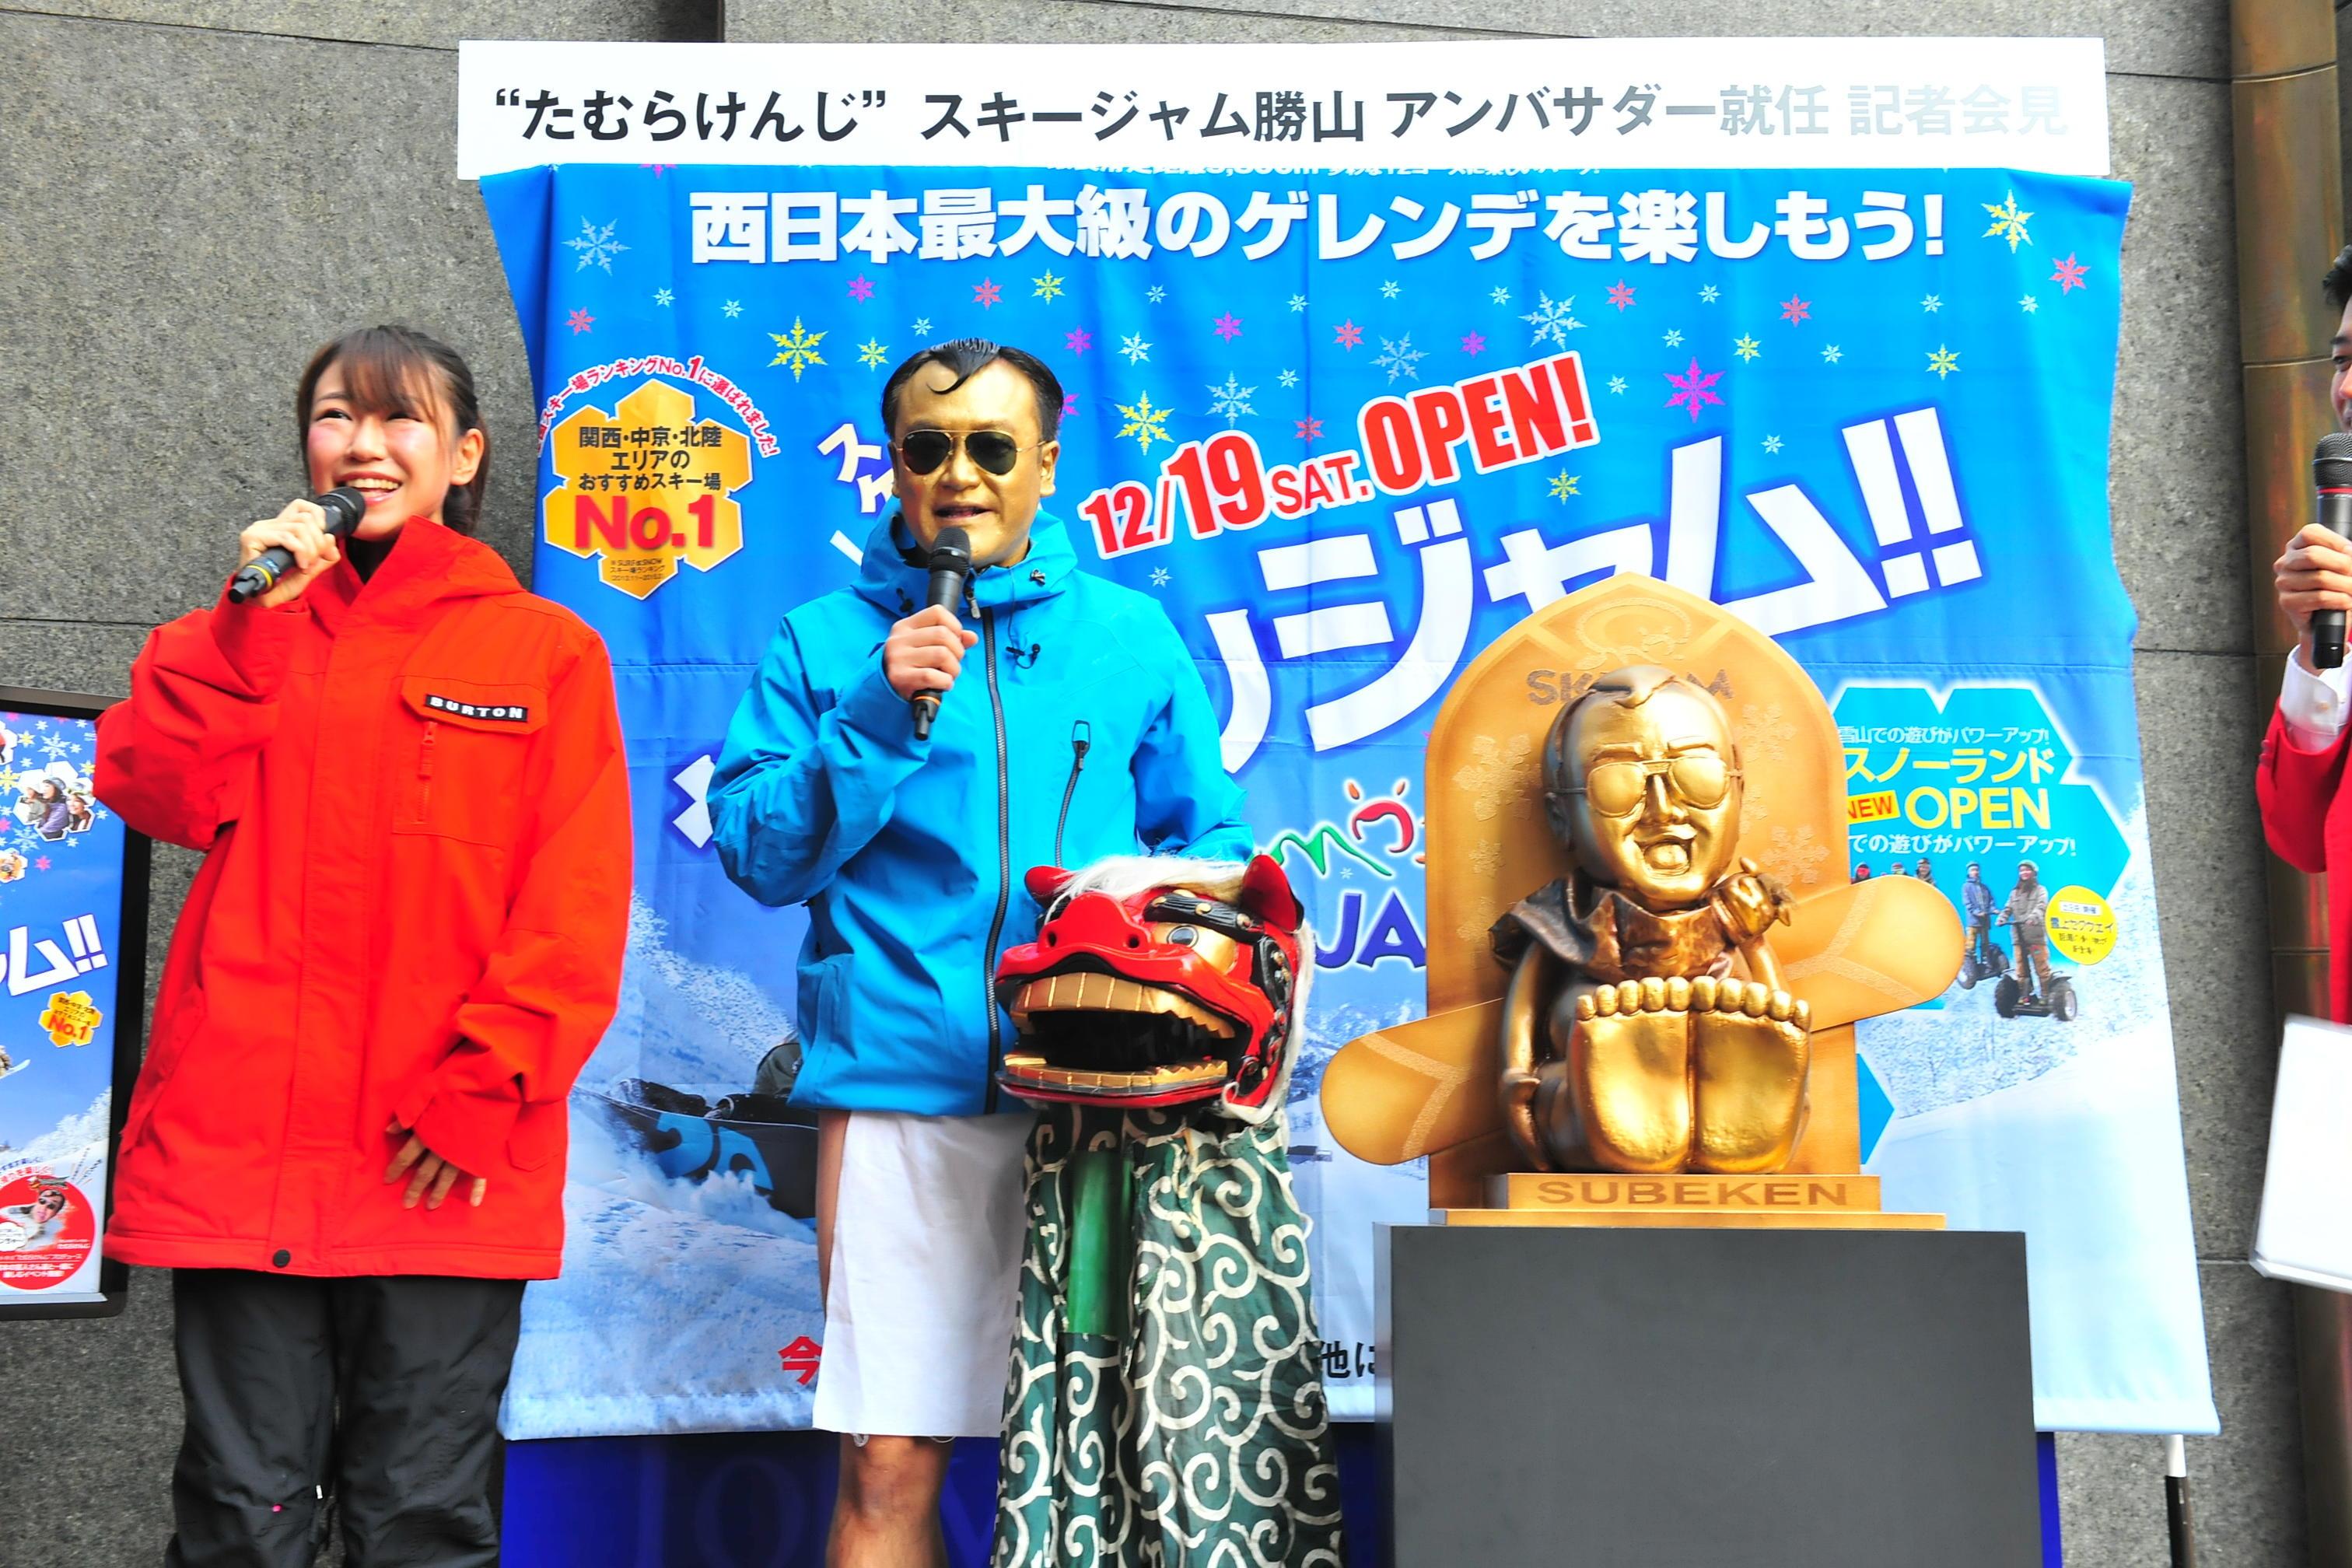 http://news.yoshimoto.co.jp/20151130194434-a7d7809fe63676eb1c171101a689ba161baee690.jpg